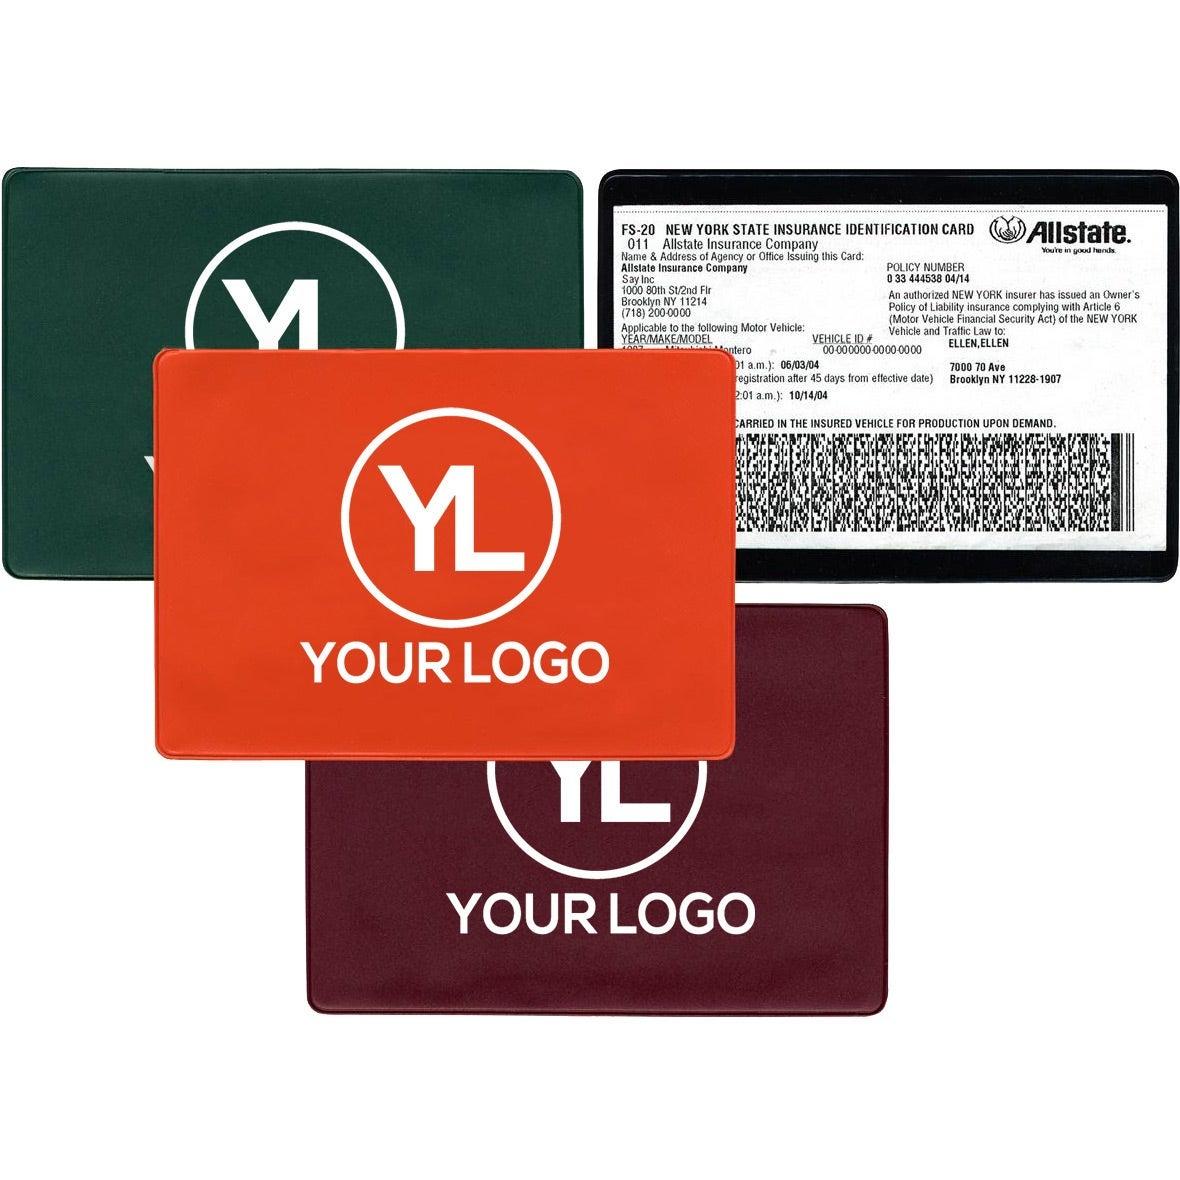 insurance card holder customized - Insurance Card Holder